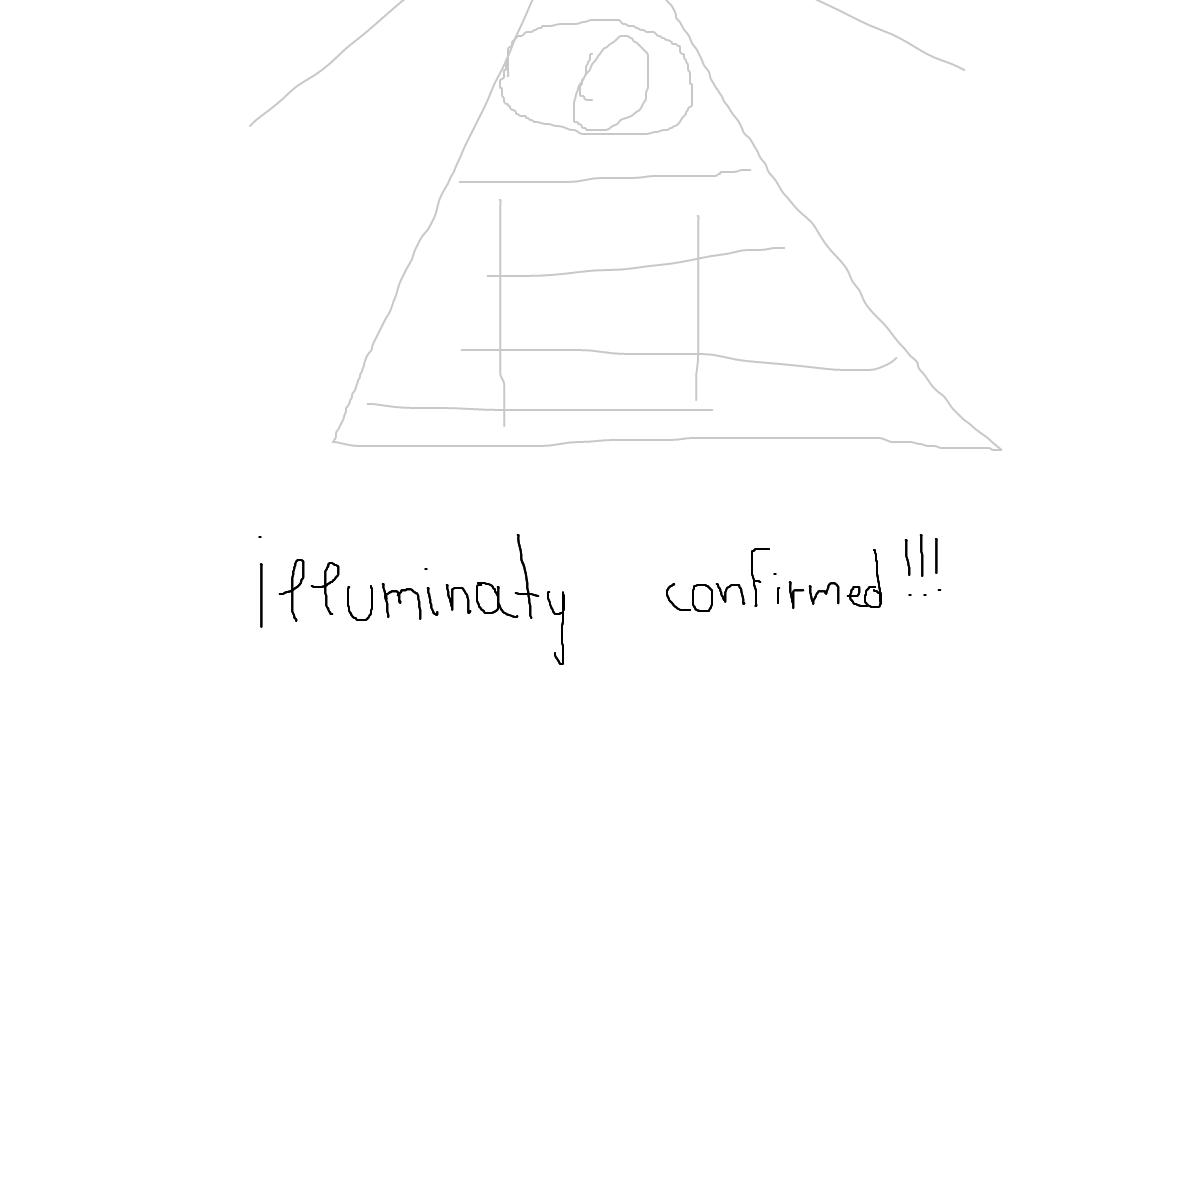 BAAAM drawing#6590 lat:45.4361381530761700lng: -75.6949691772461000